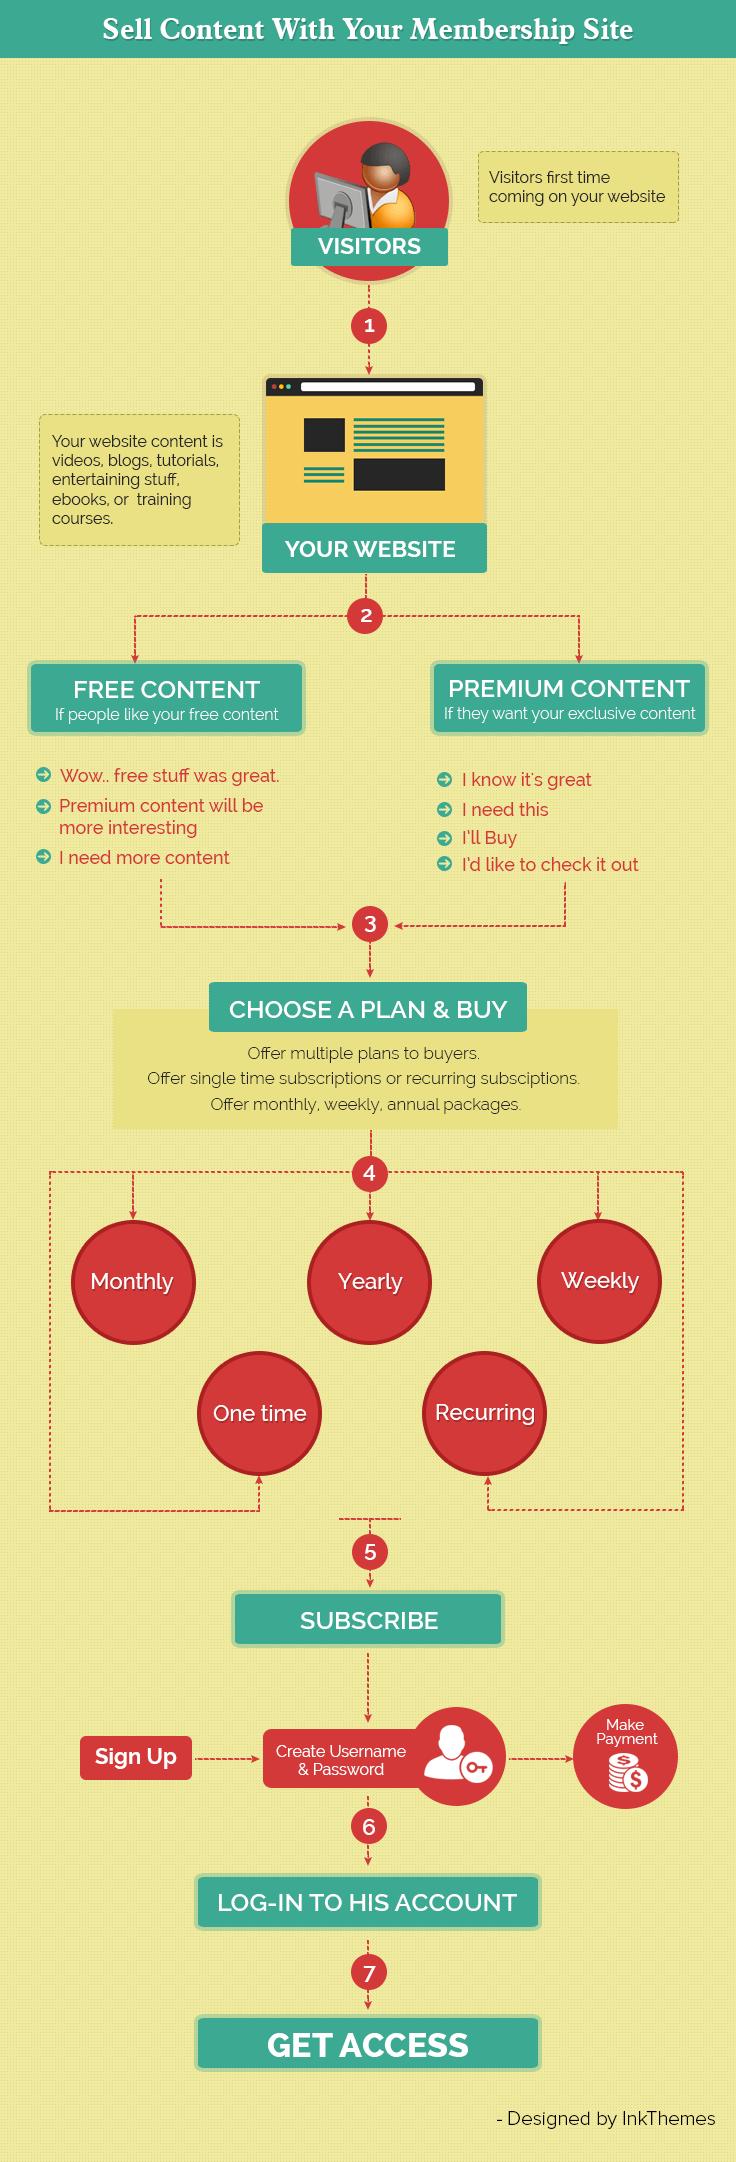 how to create a membership website - Infographics